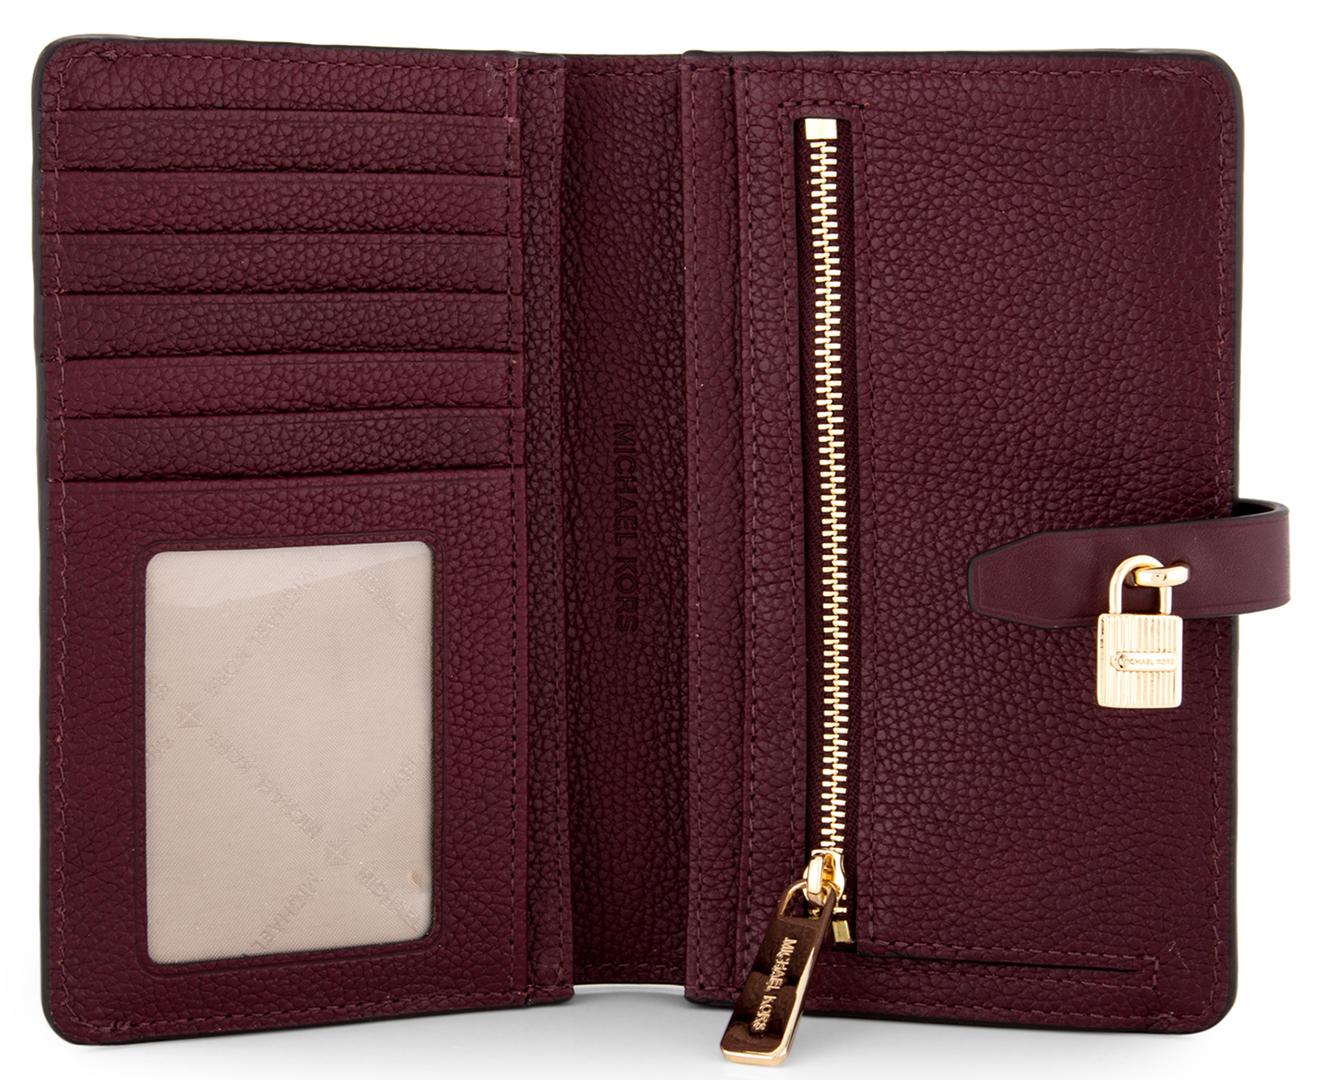 45517c4dd9fb48 Michael Kors Adele Slim Bifold Leather Wallet - Merlot | Catch.com.au